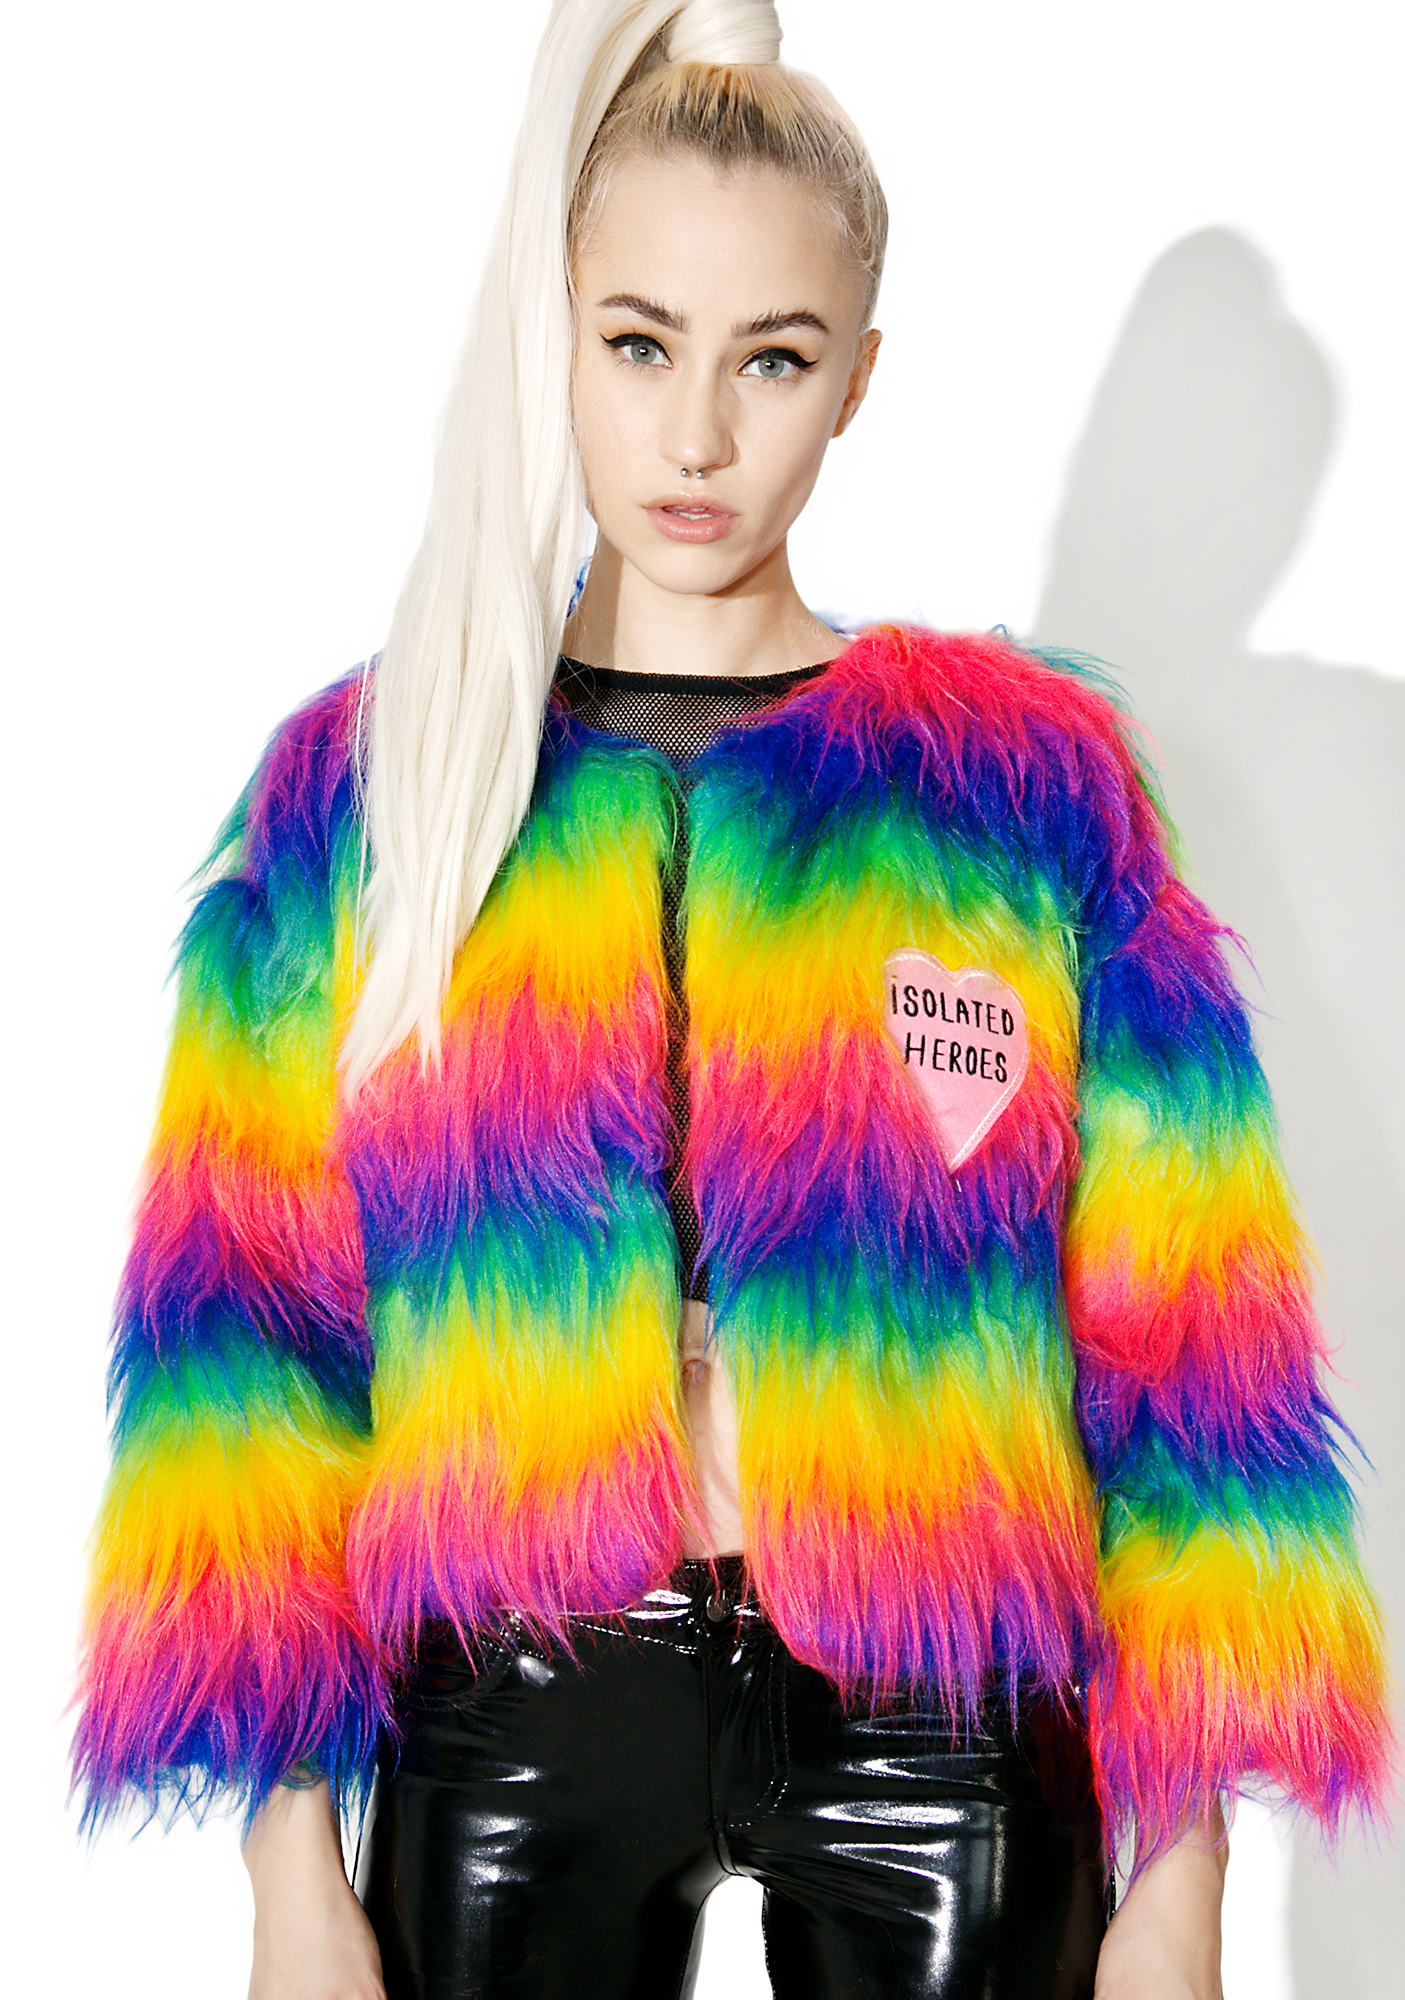 Isolated Heroes Rainbow Faux Fur Mini Coat